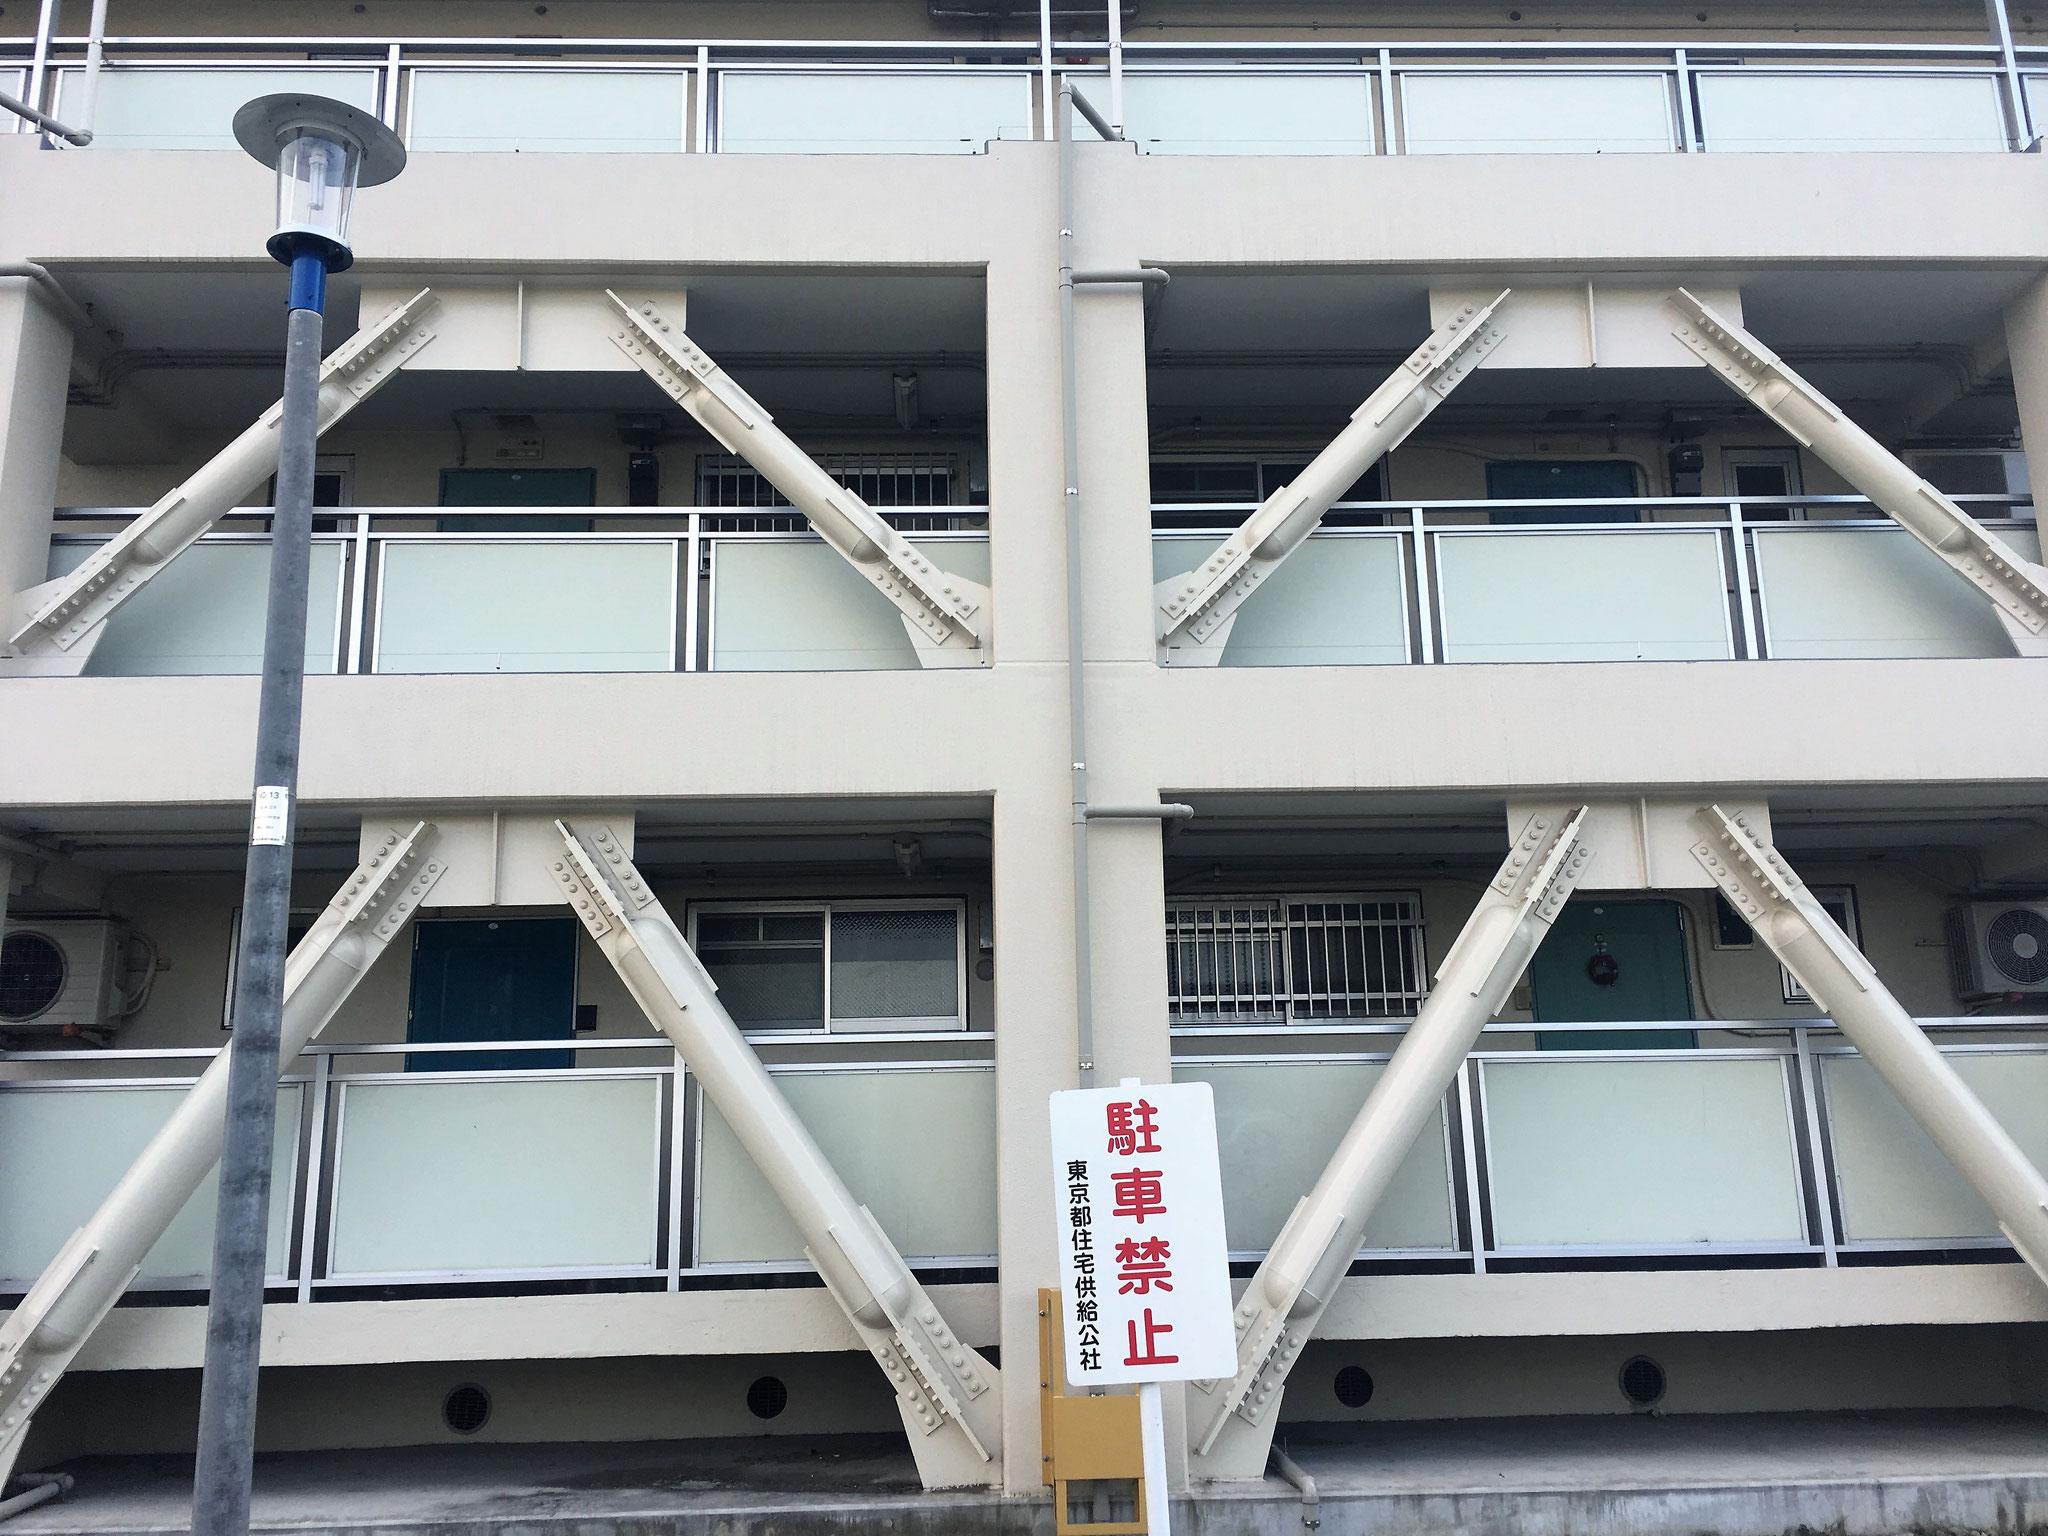 都営 塩浜アパート  / 東京都江東区/2014.9.29